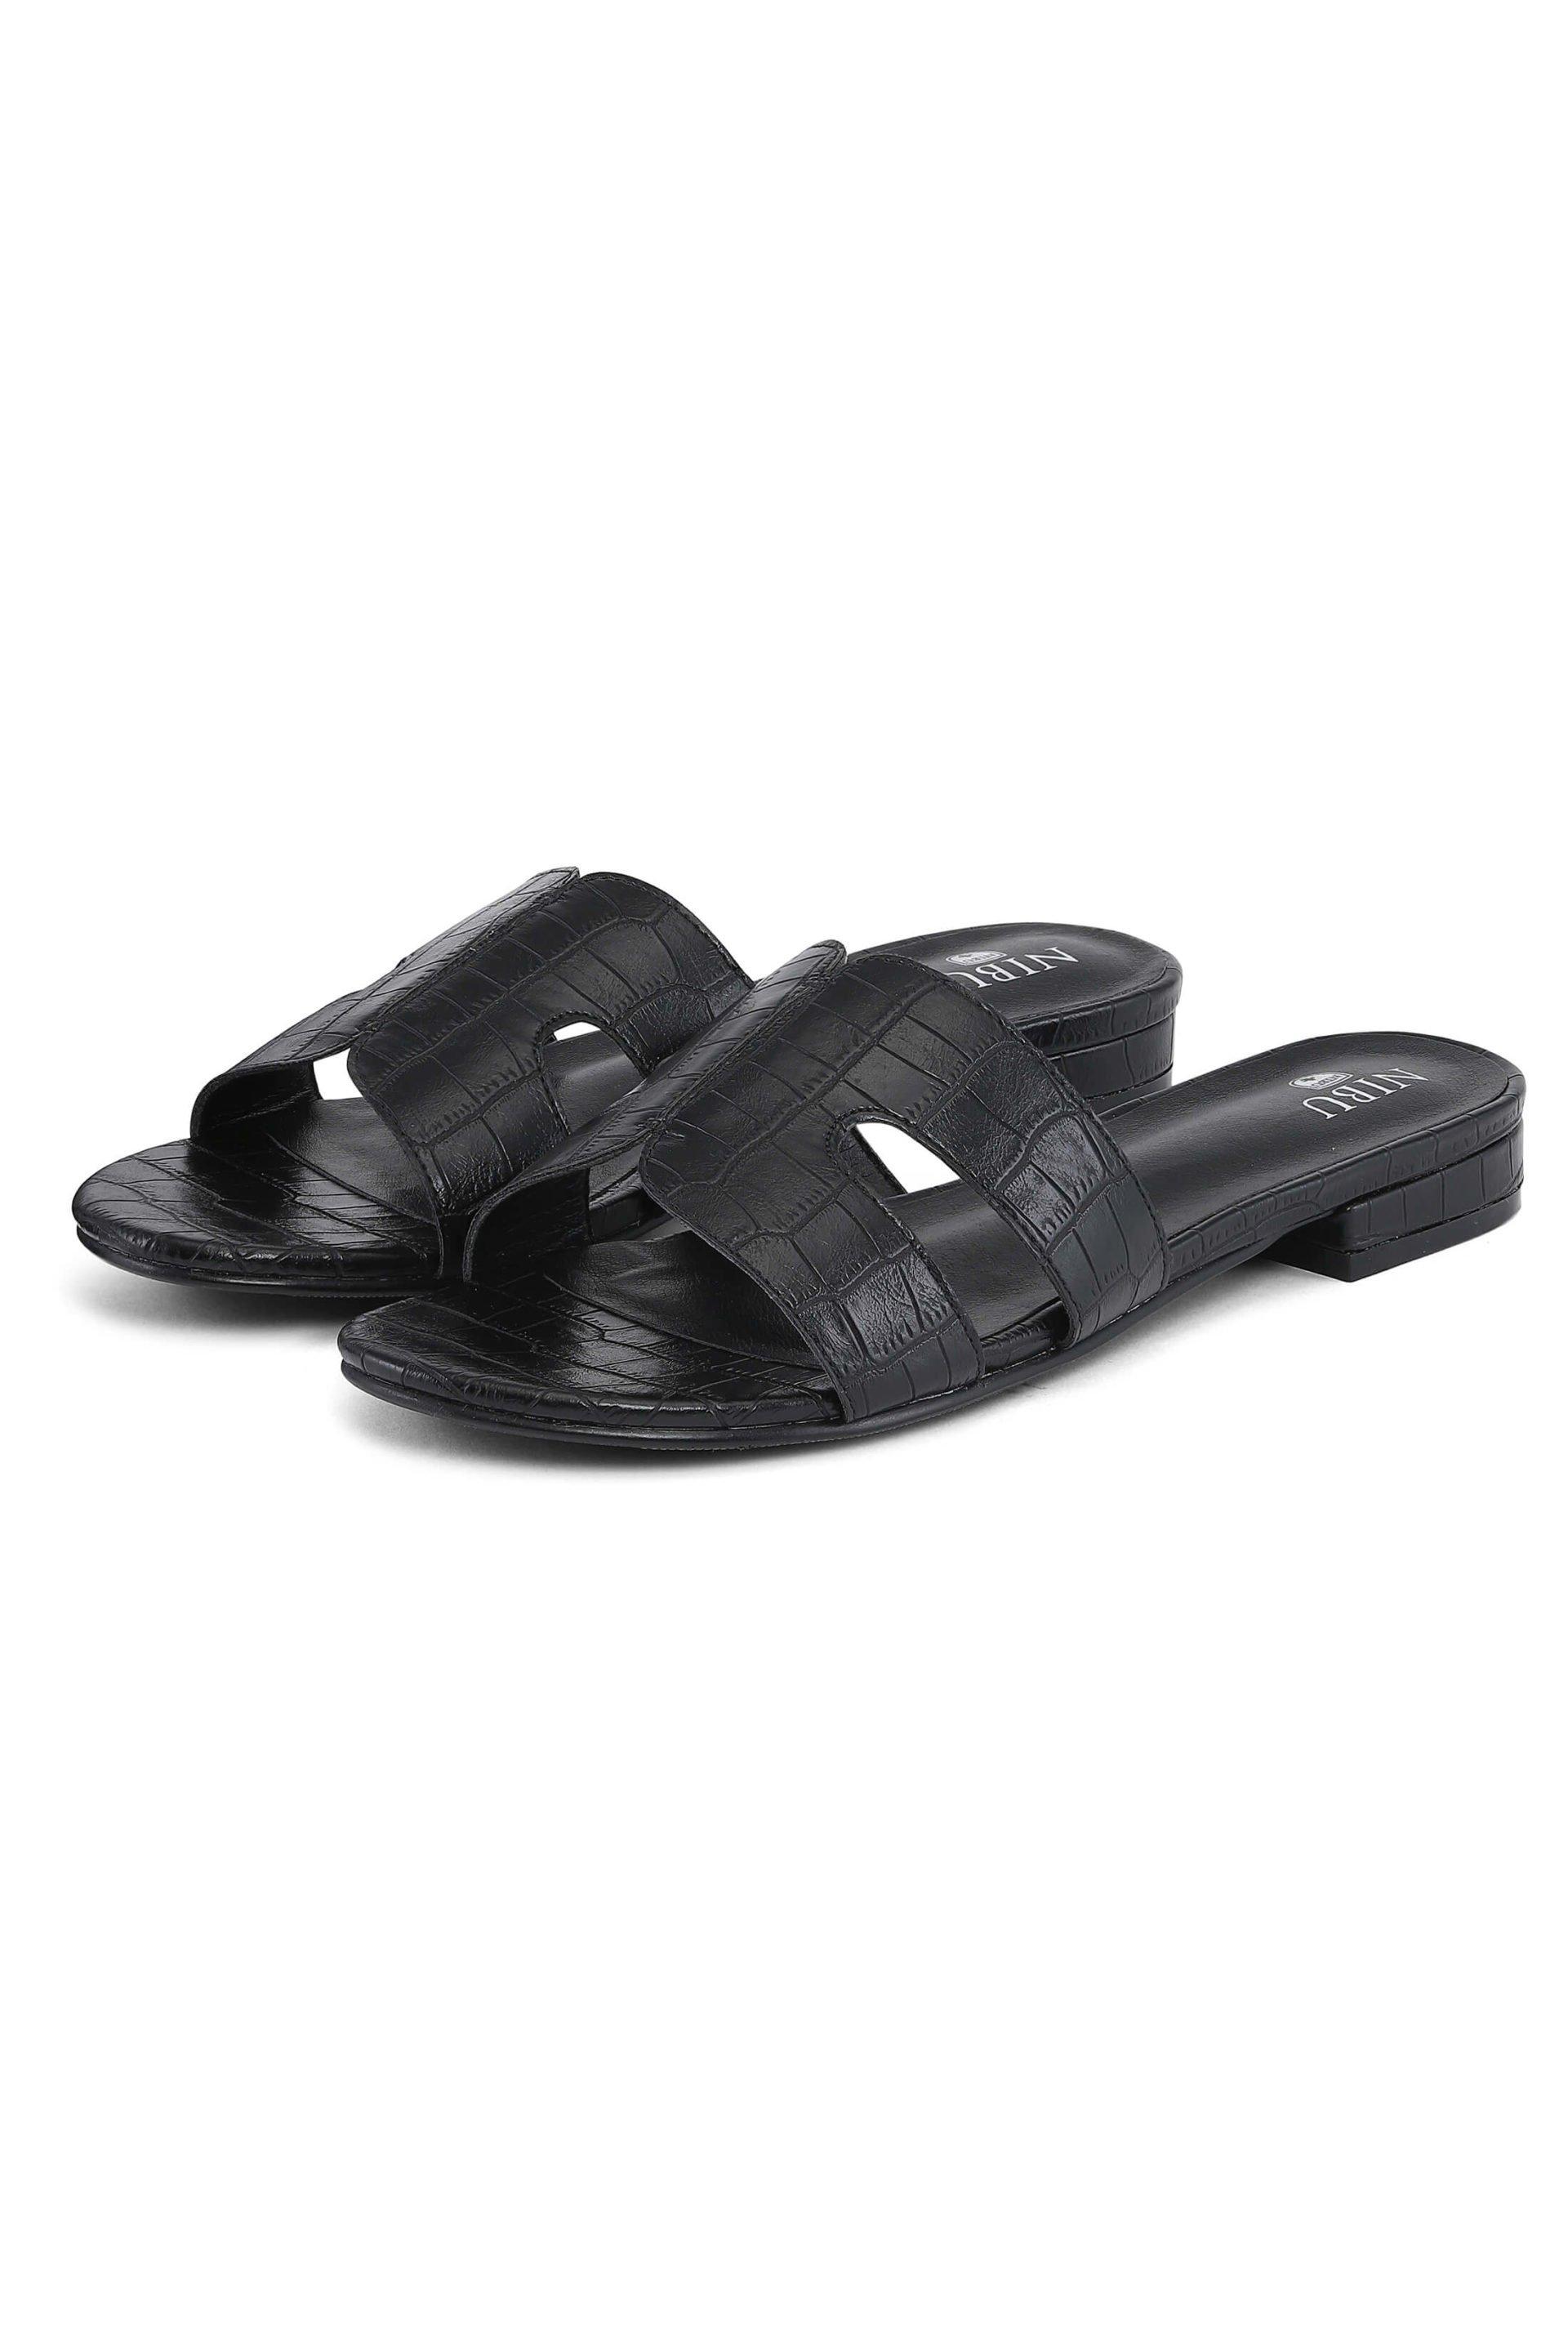 Soft black sandals